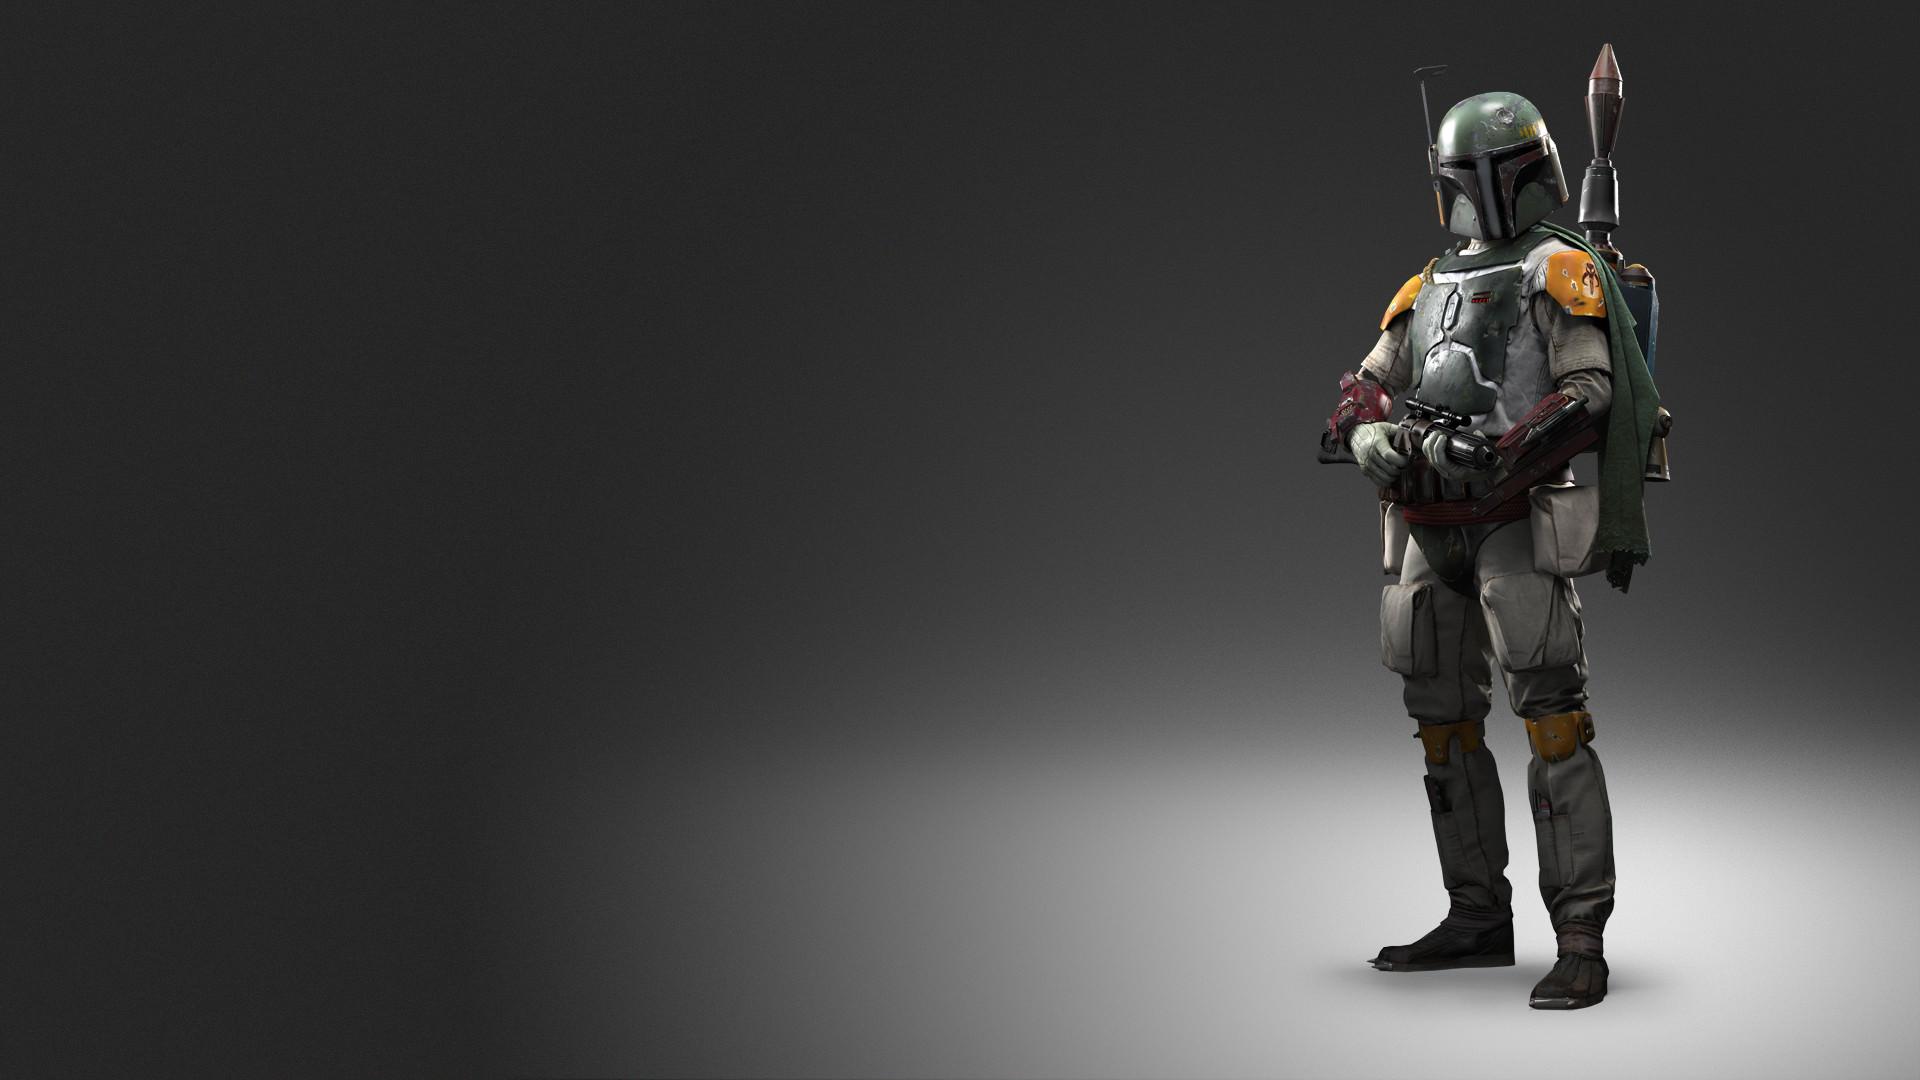 Star Wars Battlefront, Boba Fett Promo